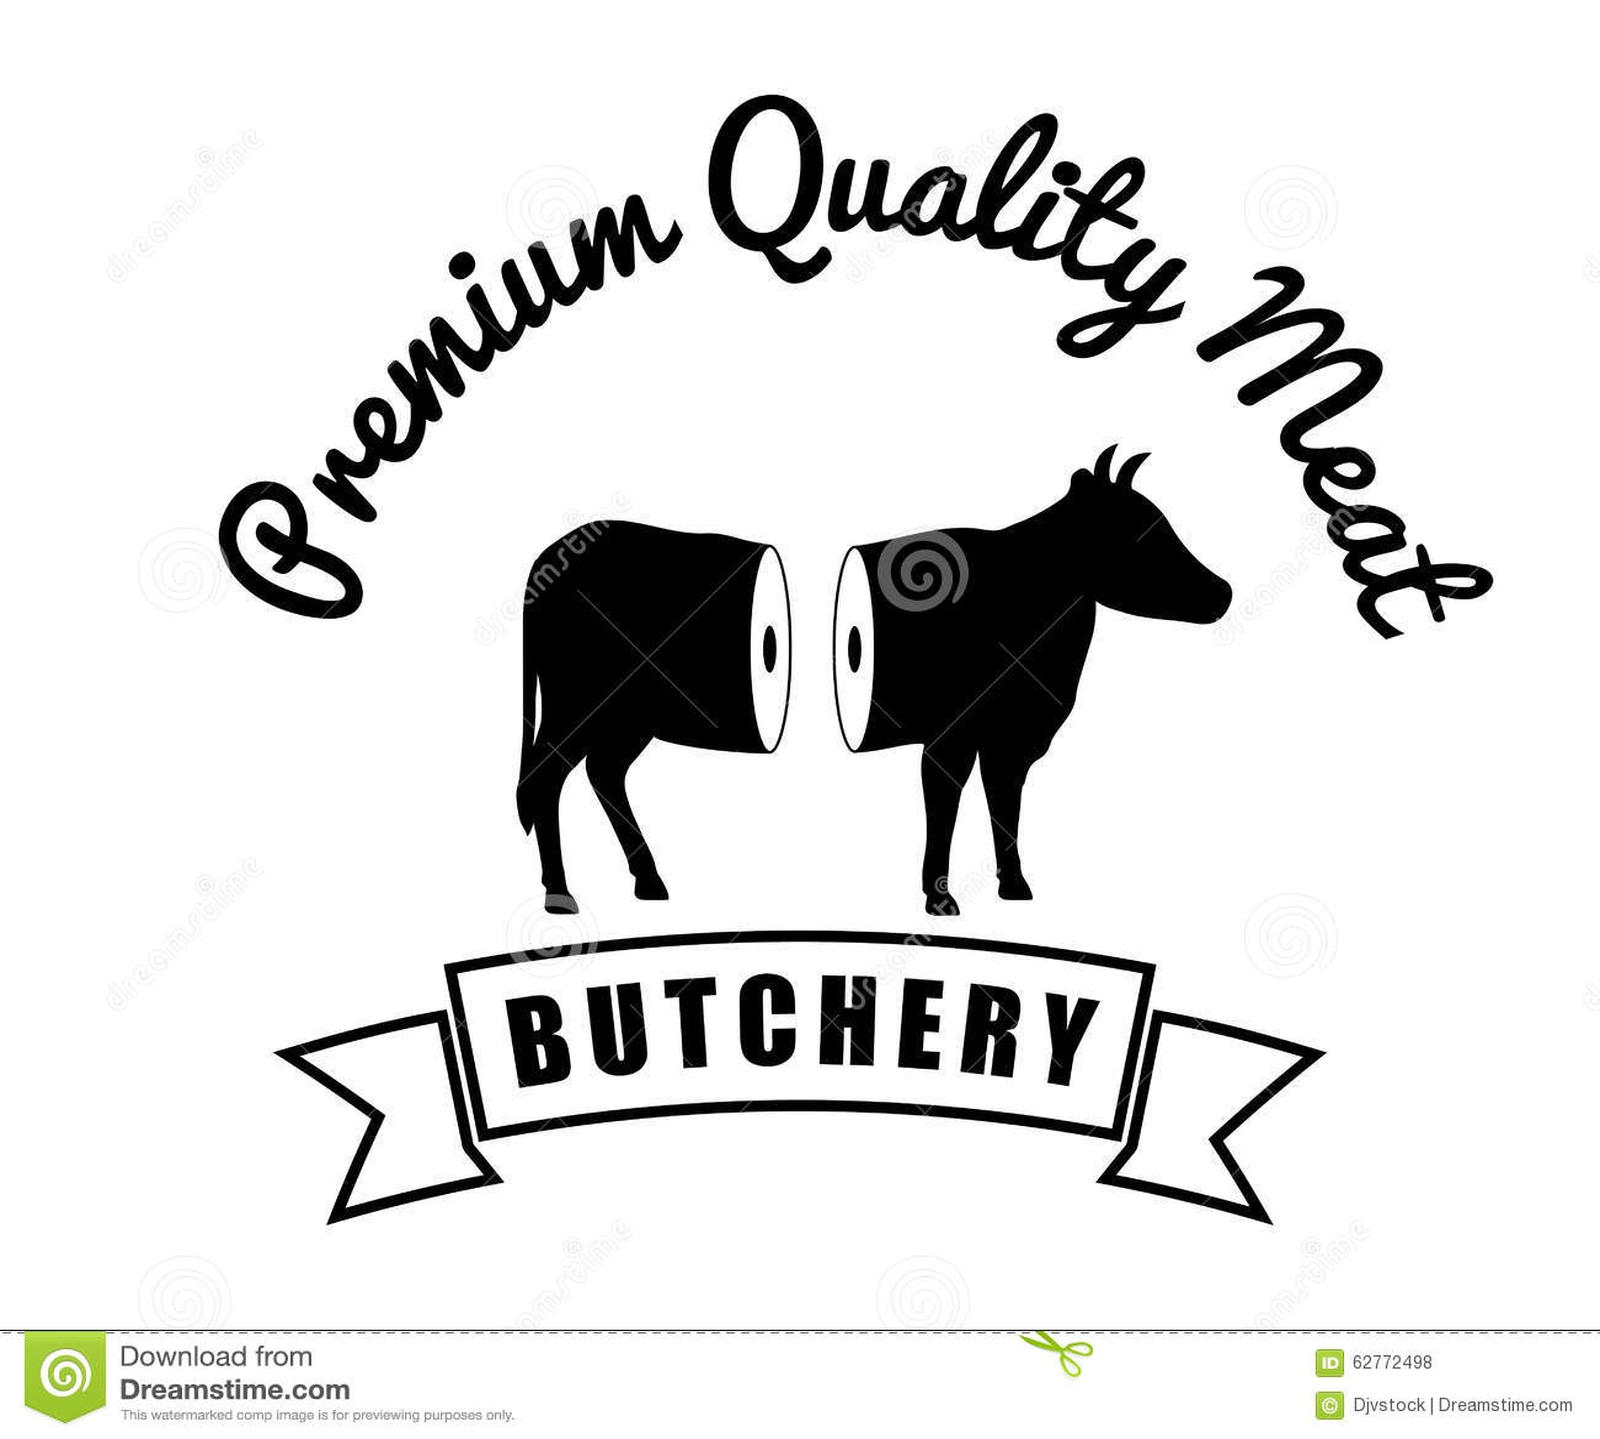 Bbq And Butchery Theme Vector Illustration